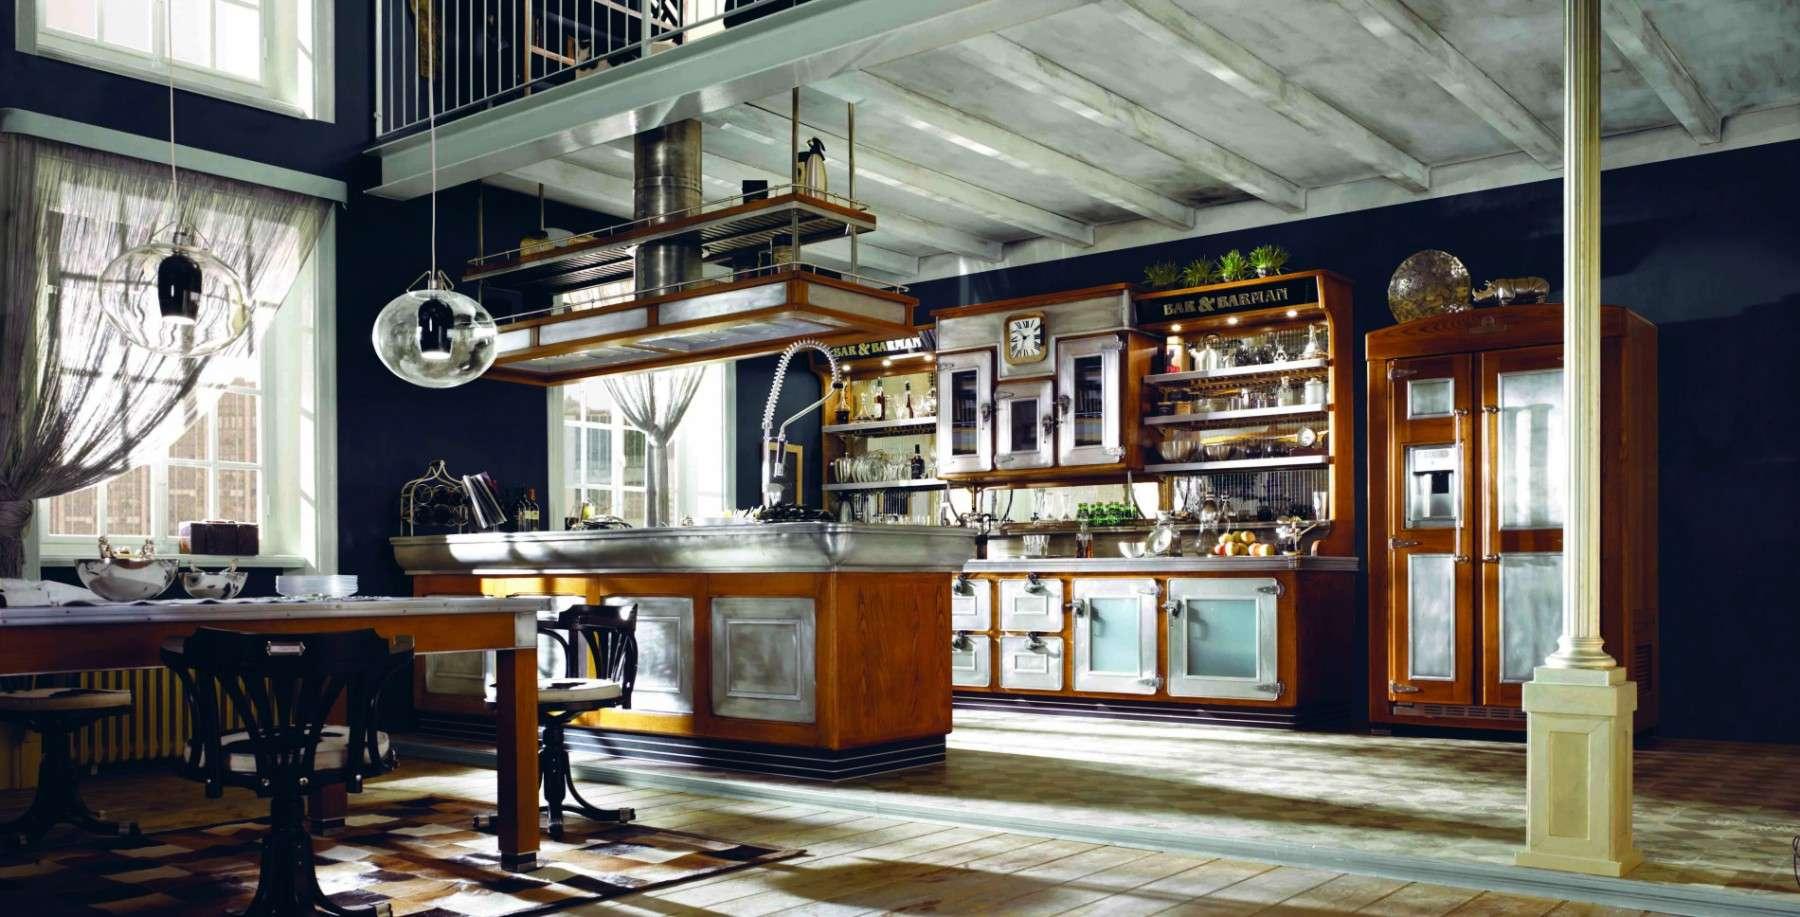 Marchi Cucine - la cucina Bar&Barman in stile industriale.